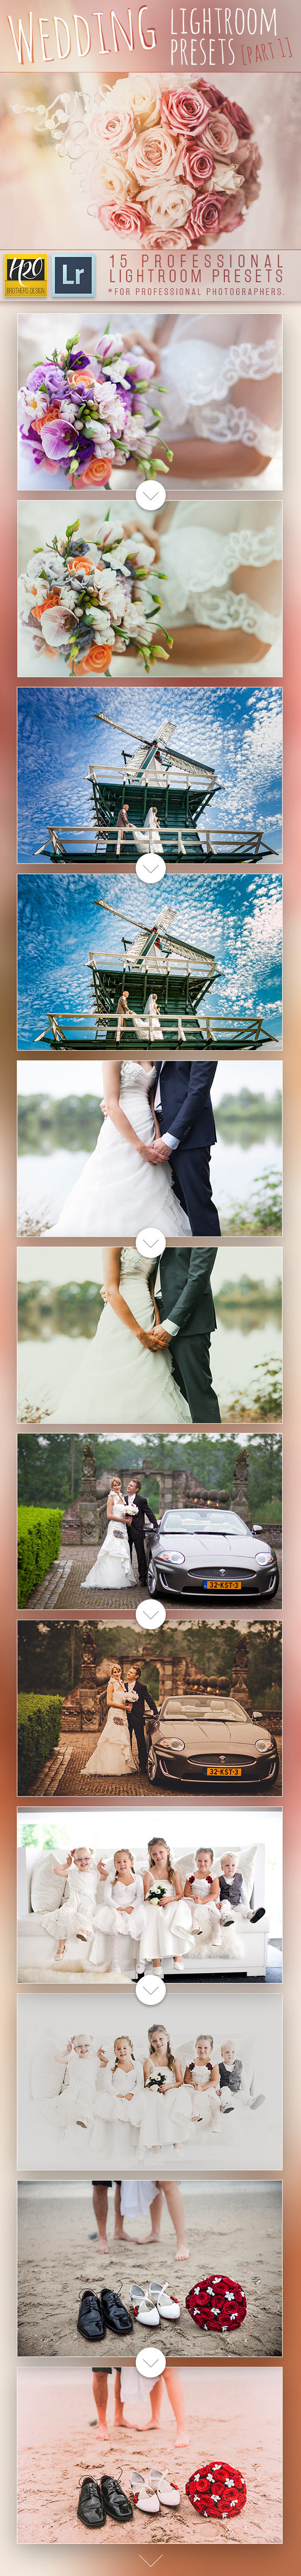 GraphicRiver Wedding Lightroom Presets [Part 1] 11440443